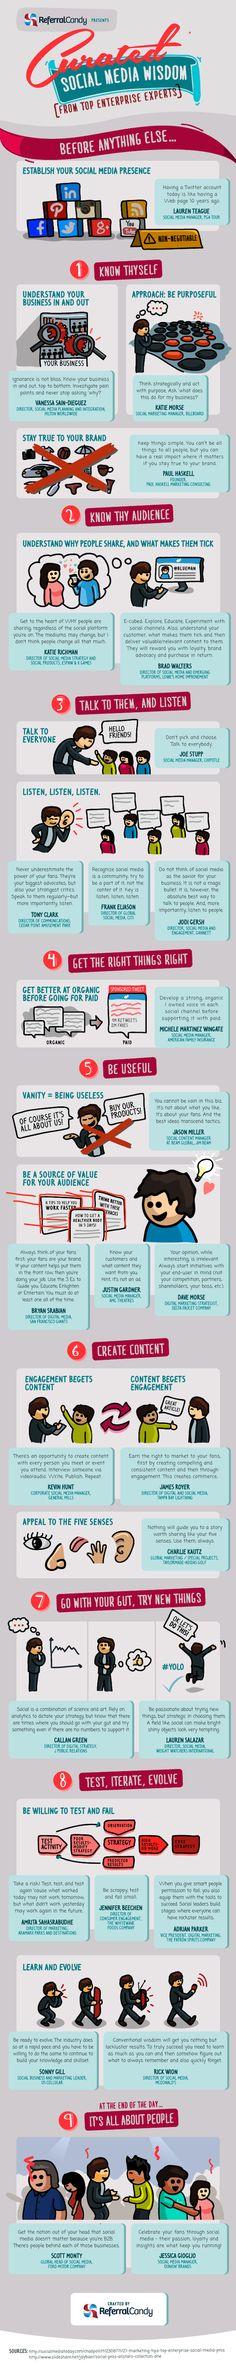 Social Media Wisdom   #Infographic #SocialMedia #SocialMediaMarketing #eCommerce #mCommerce #SocialMediaCommerce